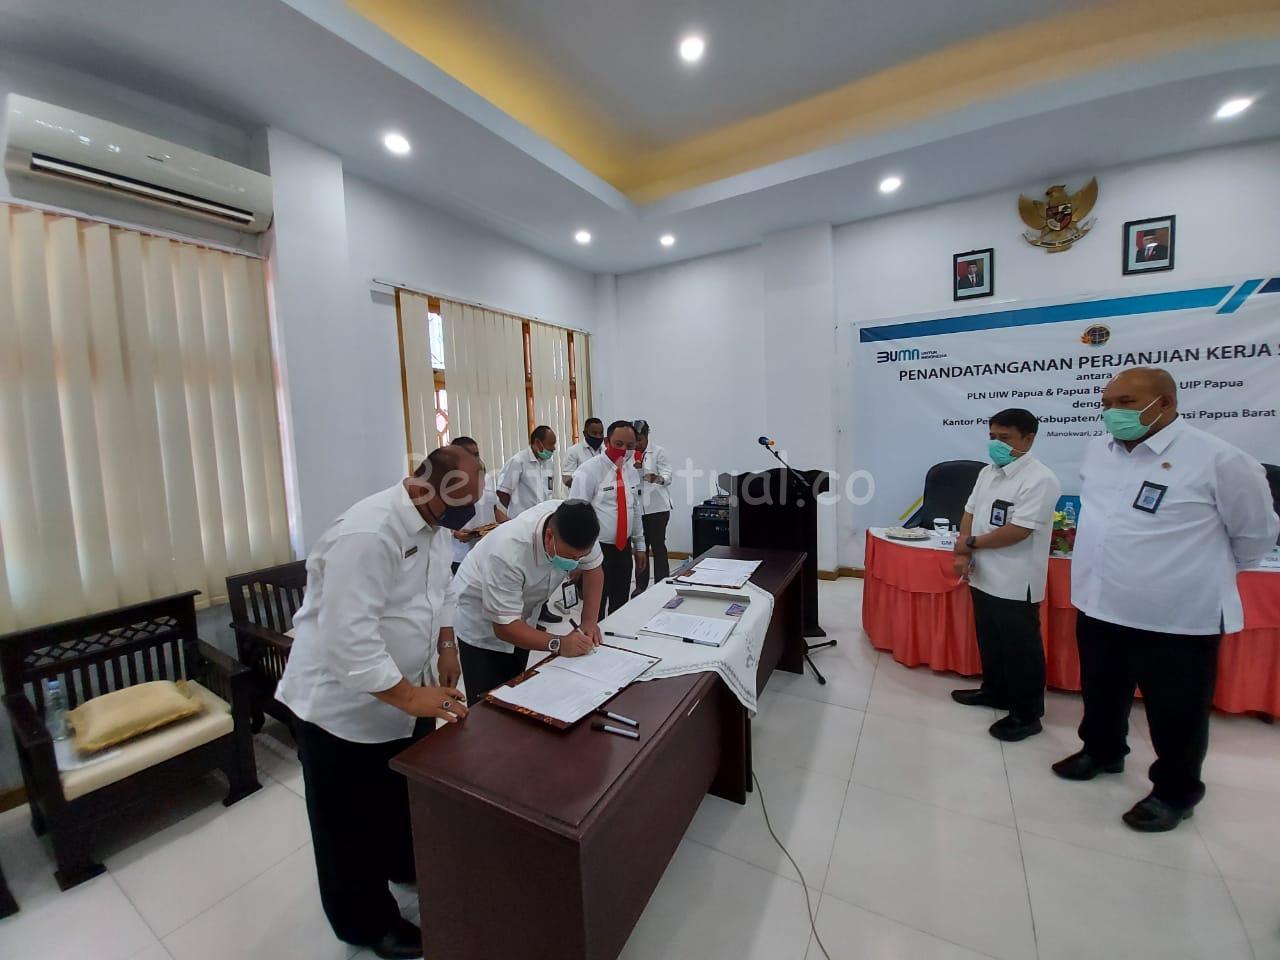 PLN Unit Papua Dan Papua Barat Teken MoU Bersama BPN Untuk Sertifikasi Tanah 7 IMG 20200722 WA0087